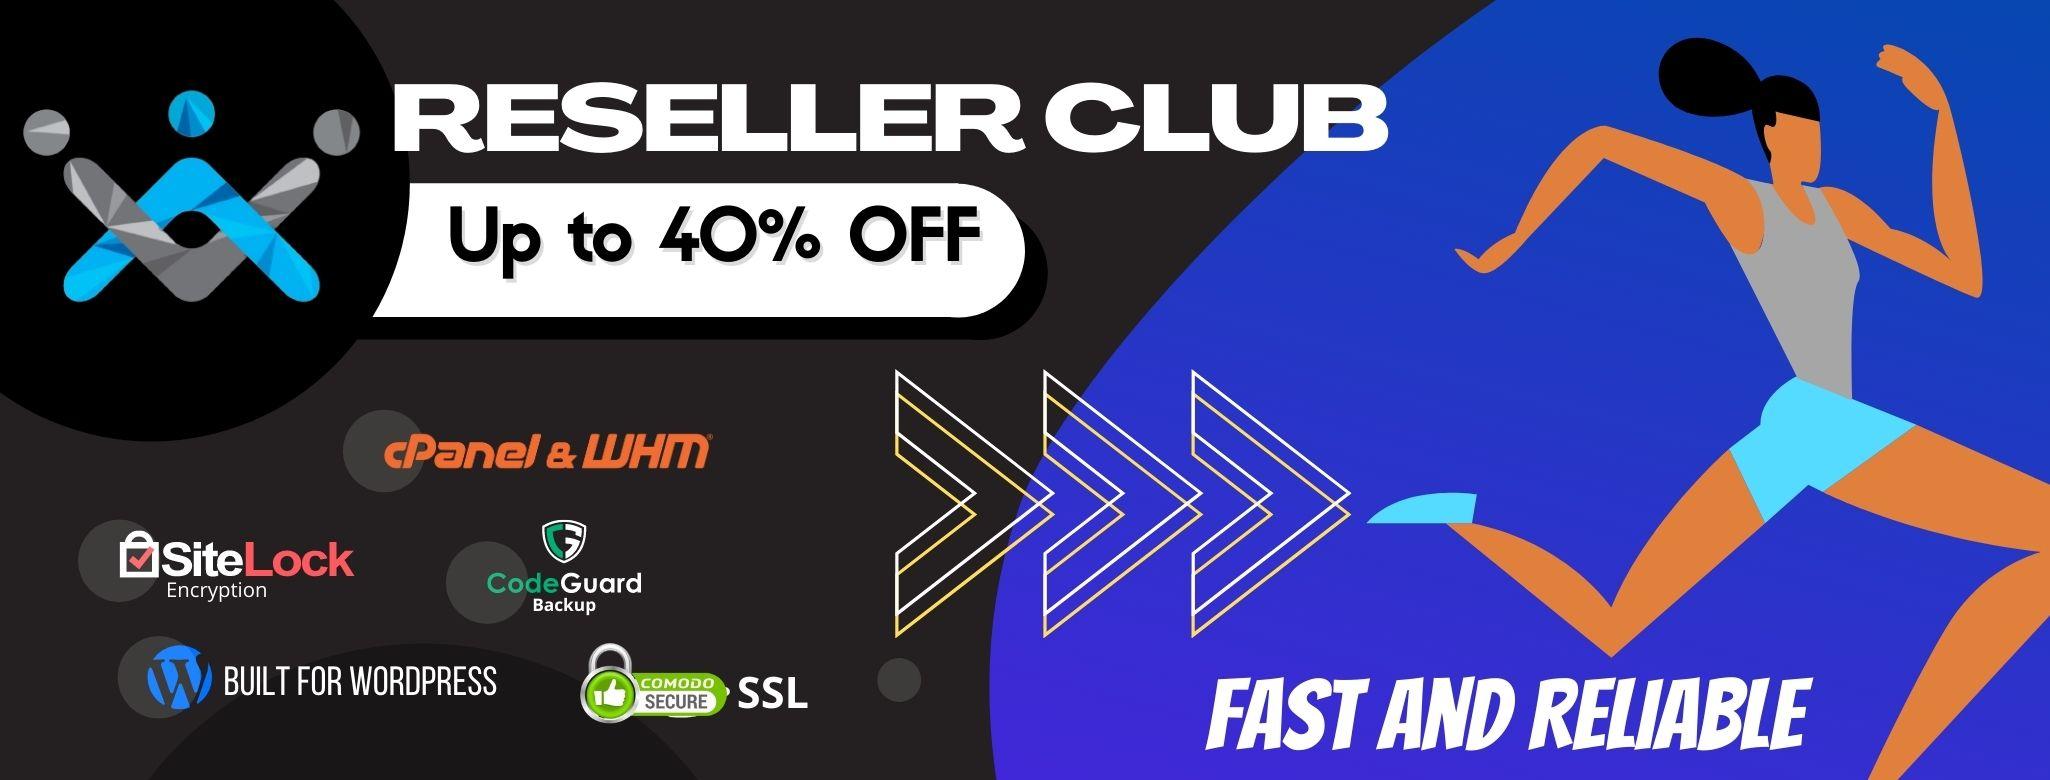 Resellerclub-Black-Friday-Hosting-Deals